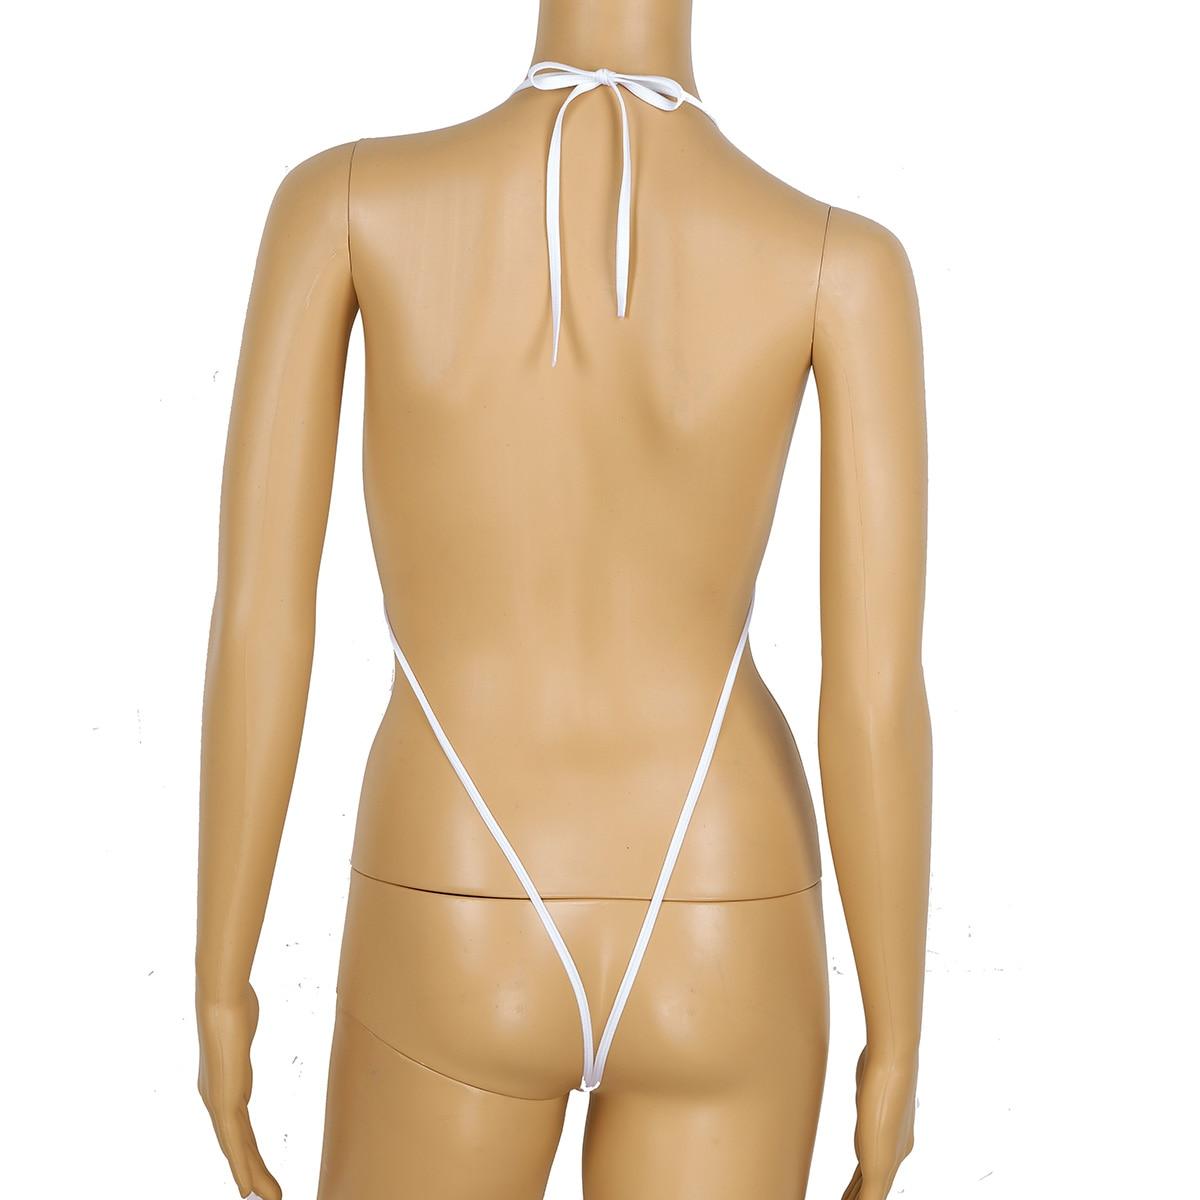 TiaoBug Women Cute Strawberry Pattern Hot Sexy Bikini Set Lingerie Halter Mini Micro Bra Tops with G-String Swimsuit Beachwear 4